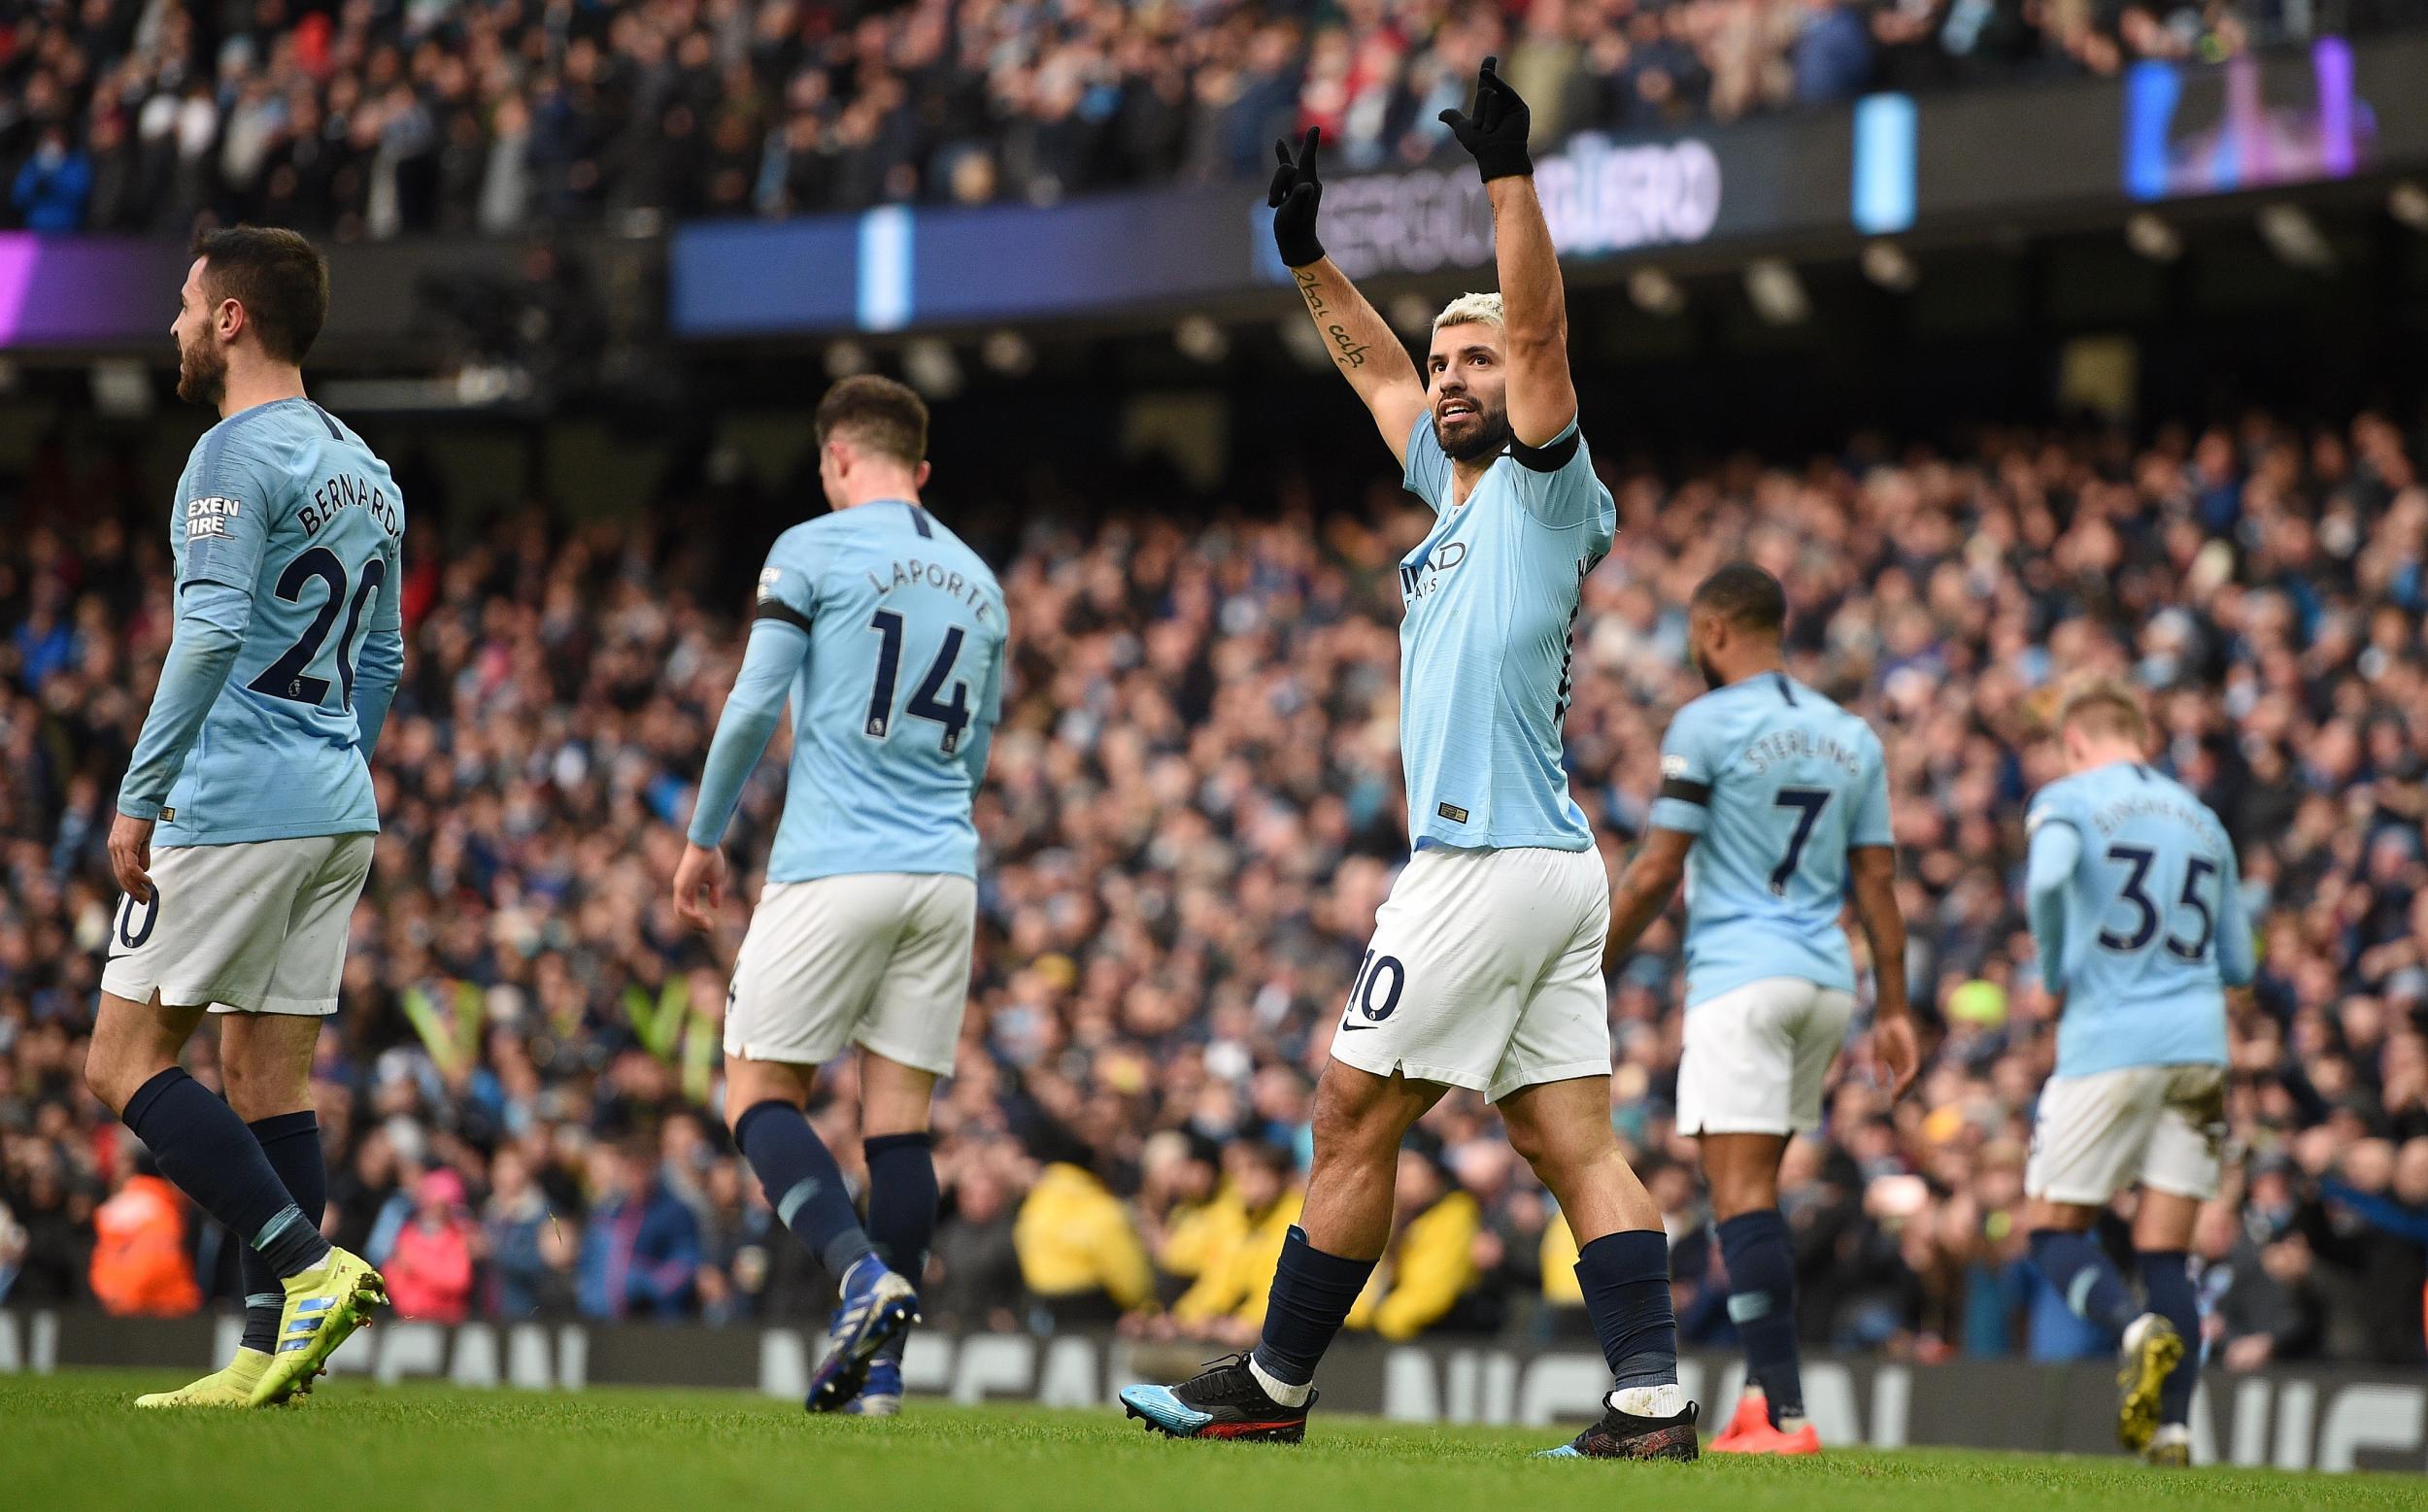 Manchester City Contra Chelsea: Đá Vòng 5 FA Cup, Man City 'dùng Dao Mổ Trâu Giết Gà